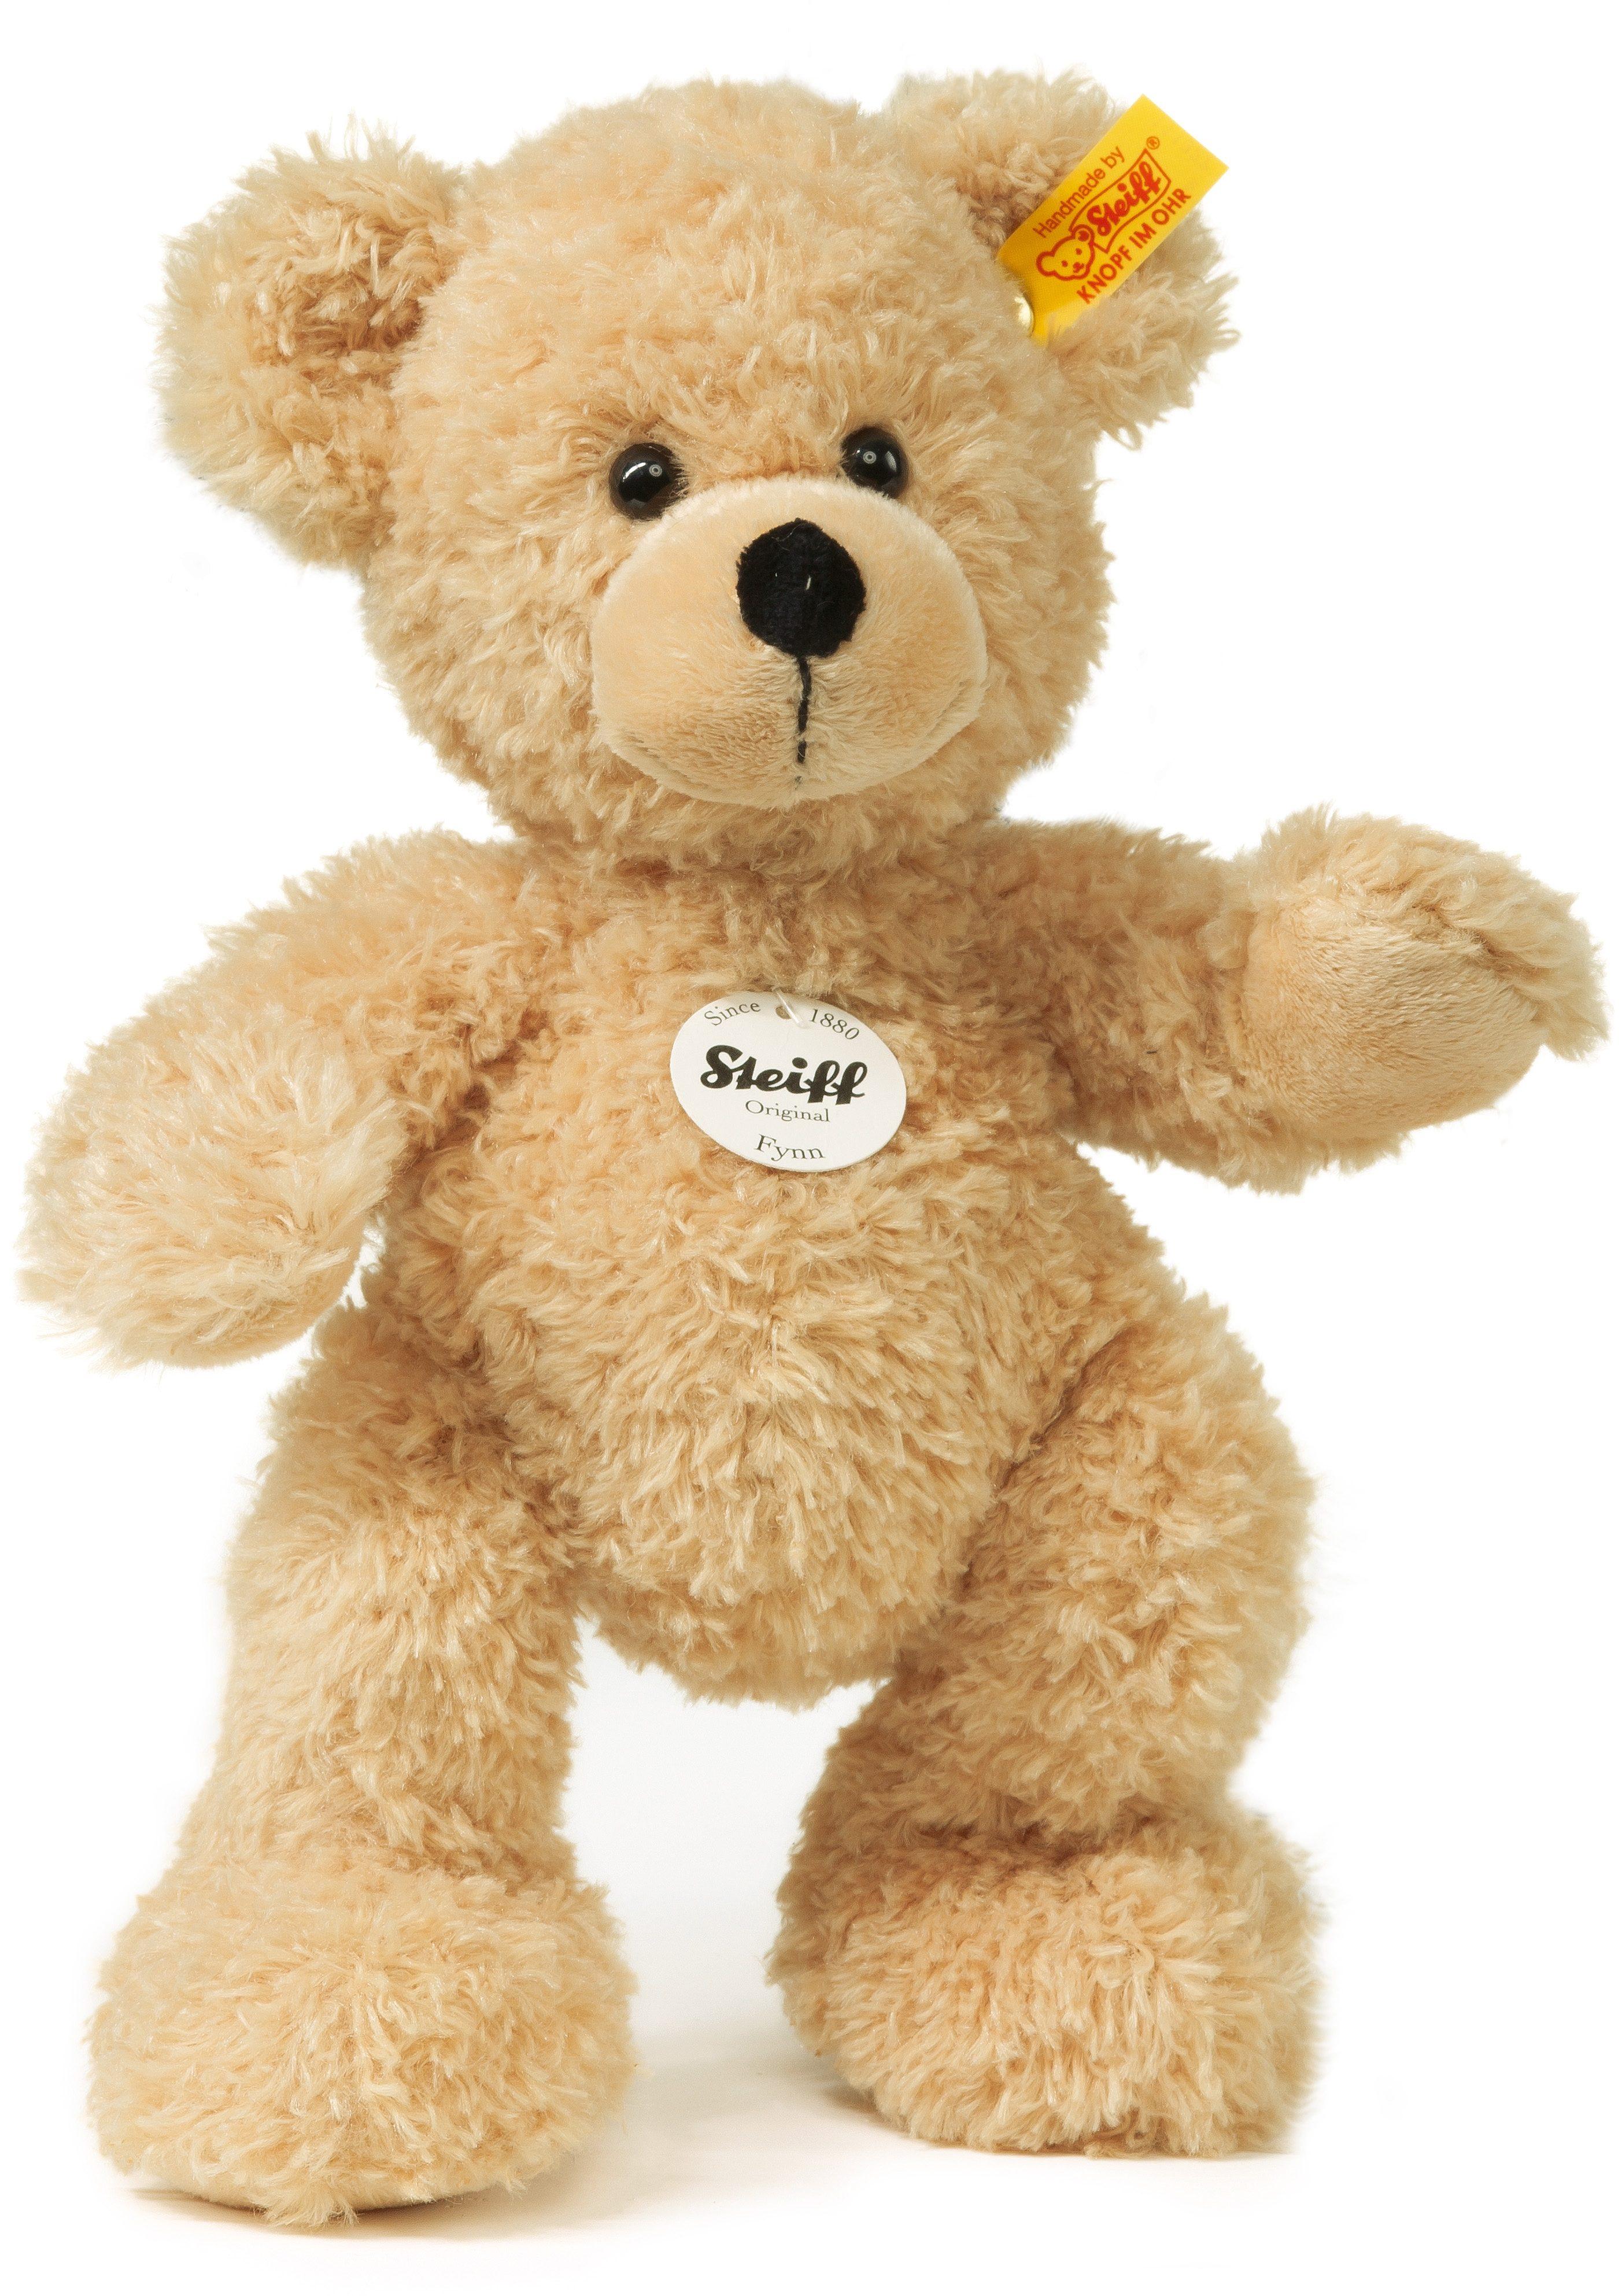 Steiff Plüschtier, 28 cm, »Fynn Teddybär«